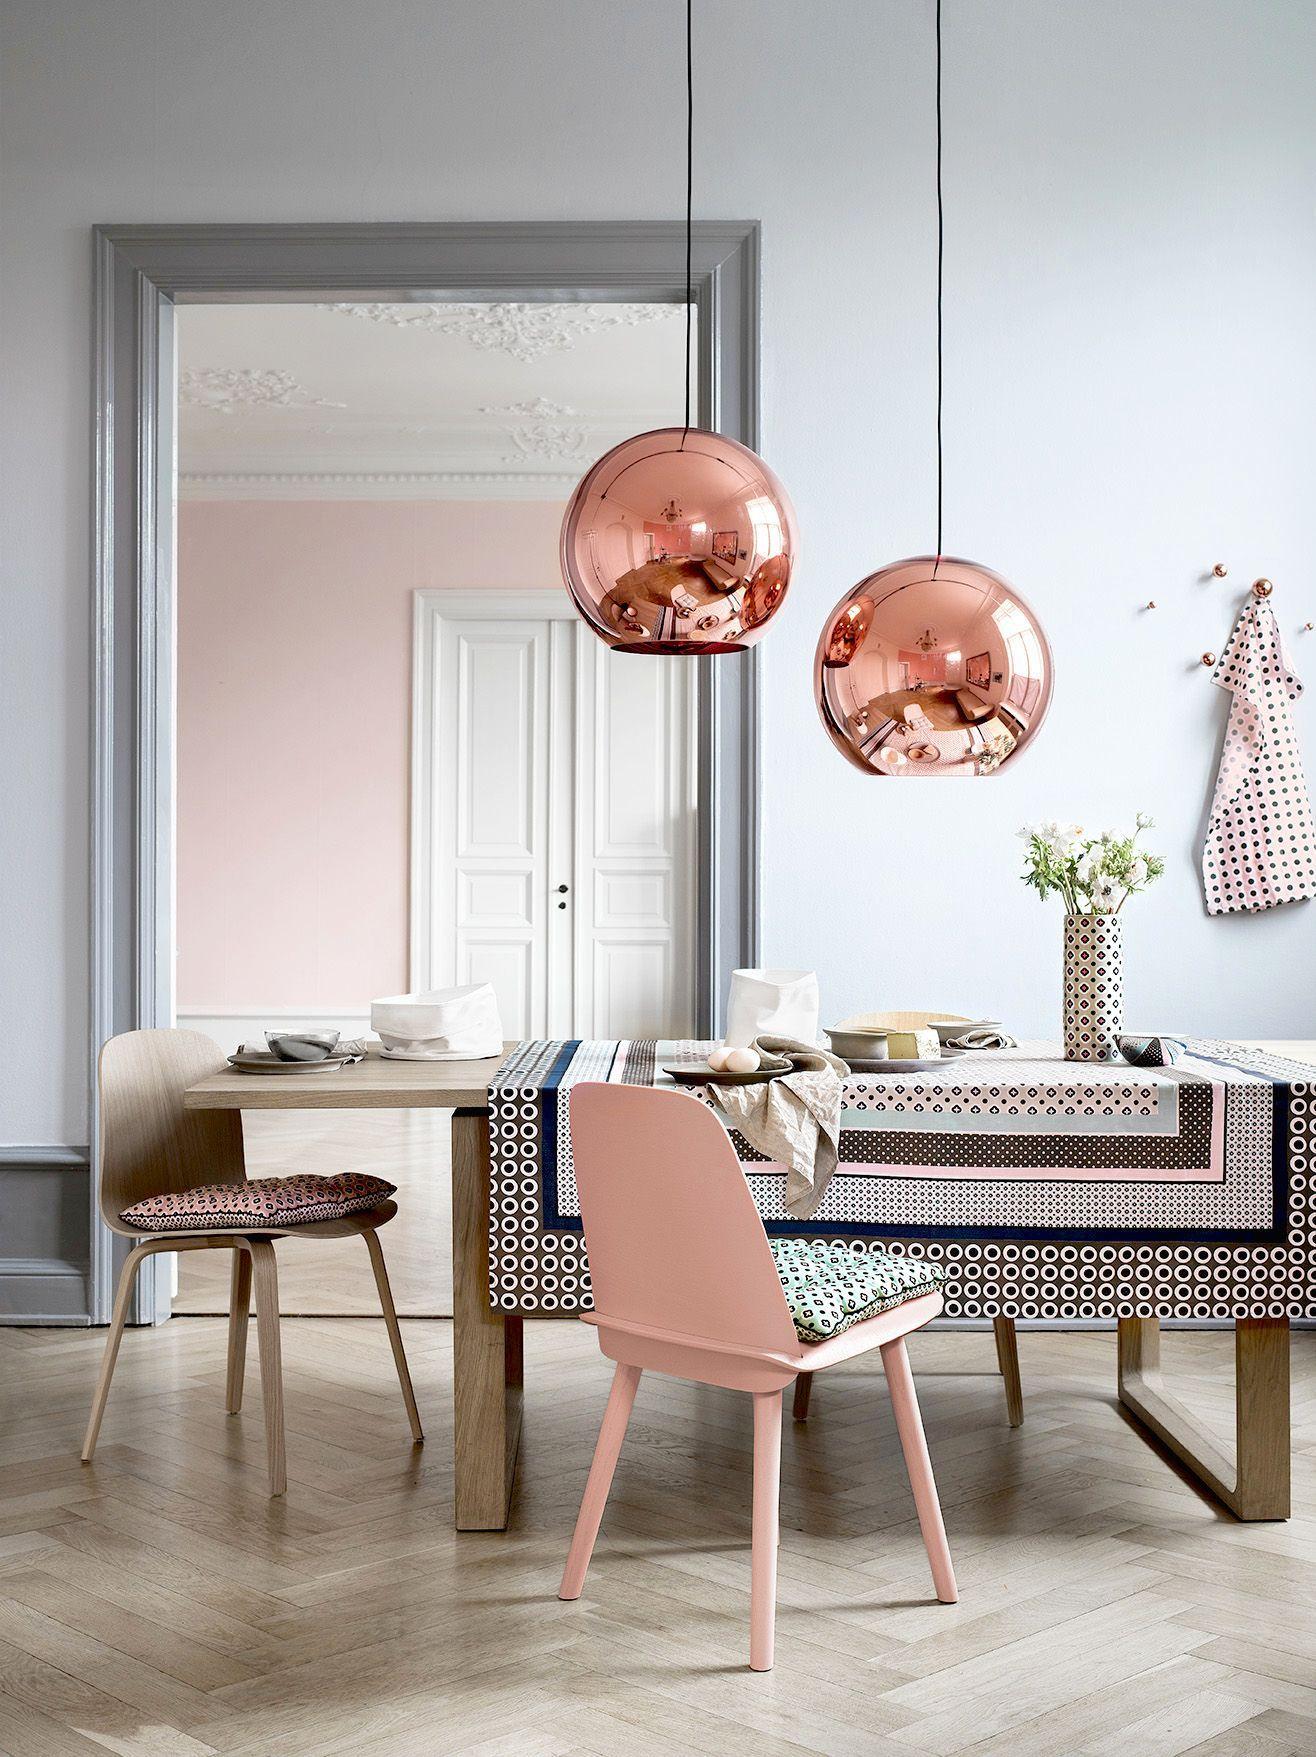 trendy copper pendant light copper pendant light kitchen Large bowl copper lighting fixtures